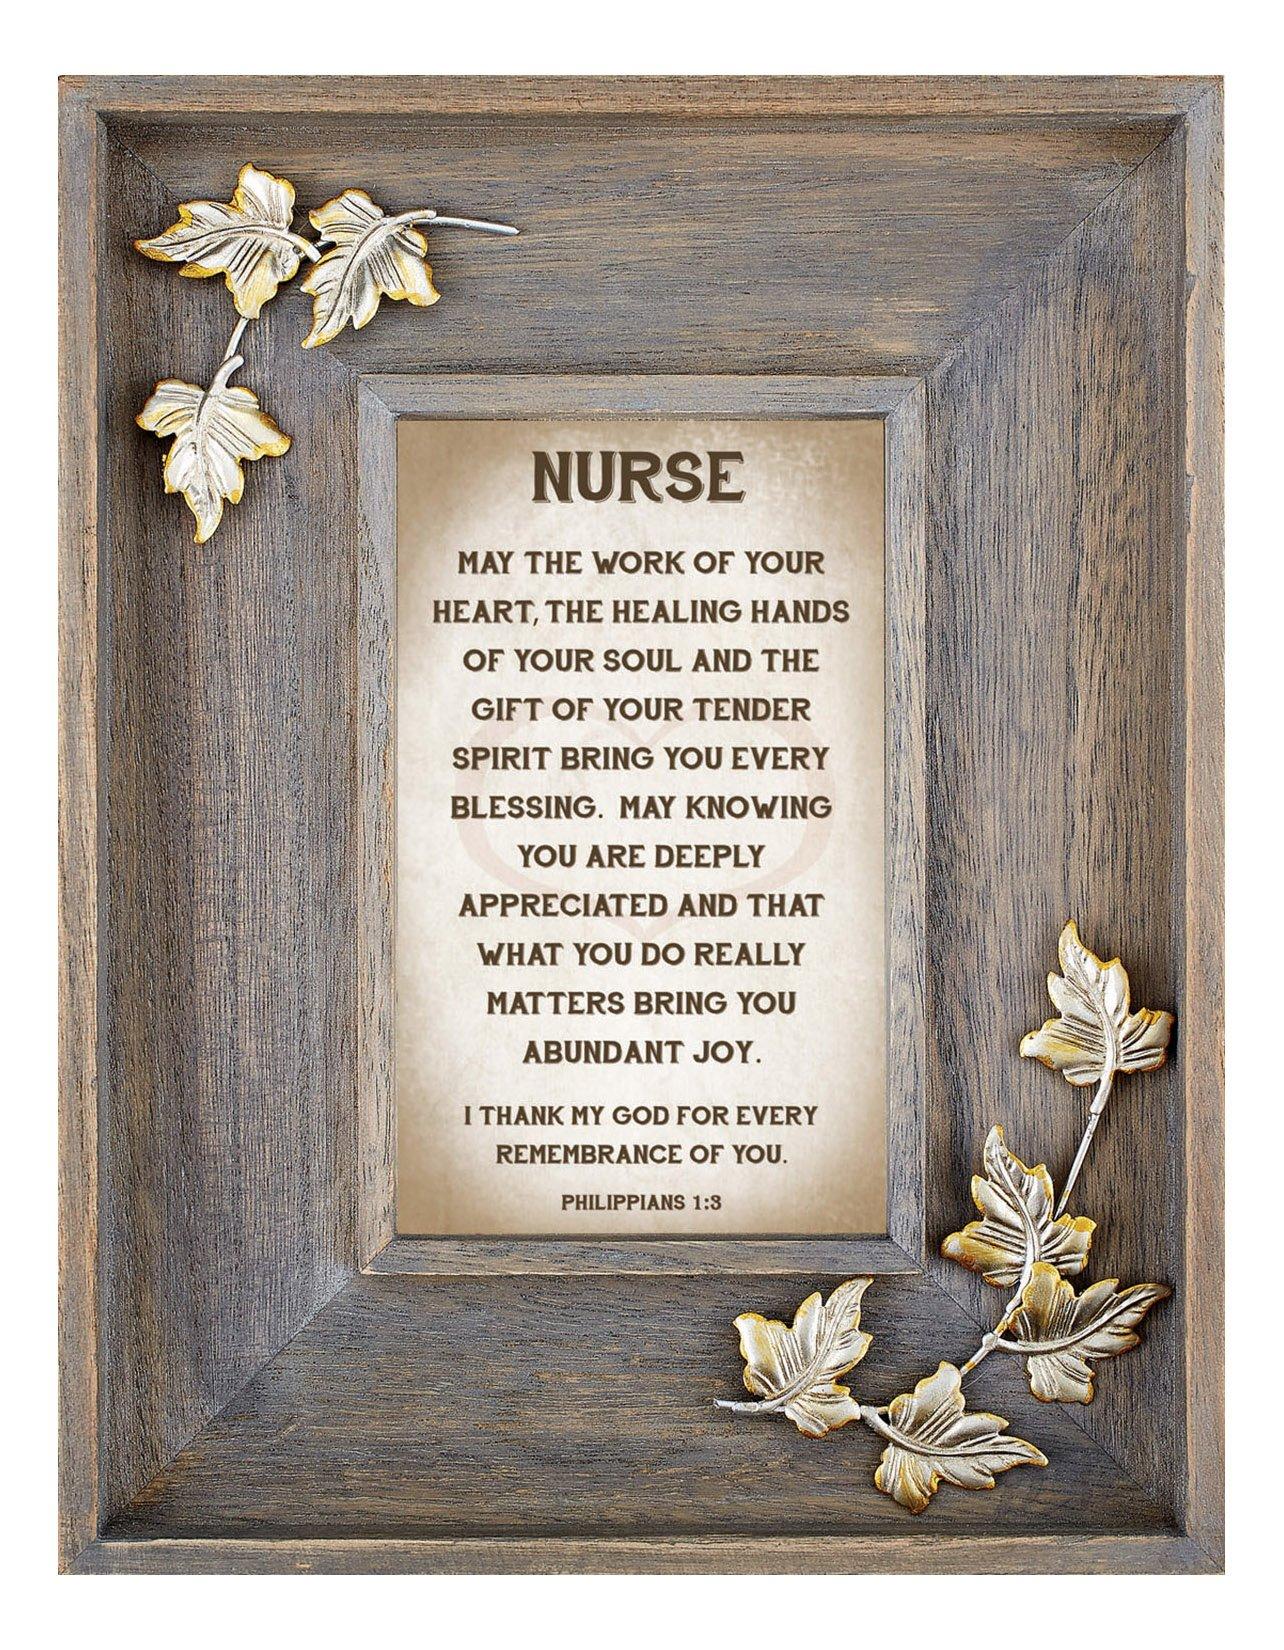 LoveLea Down Home Collection Tabletop Frame, Nurse